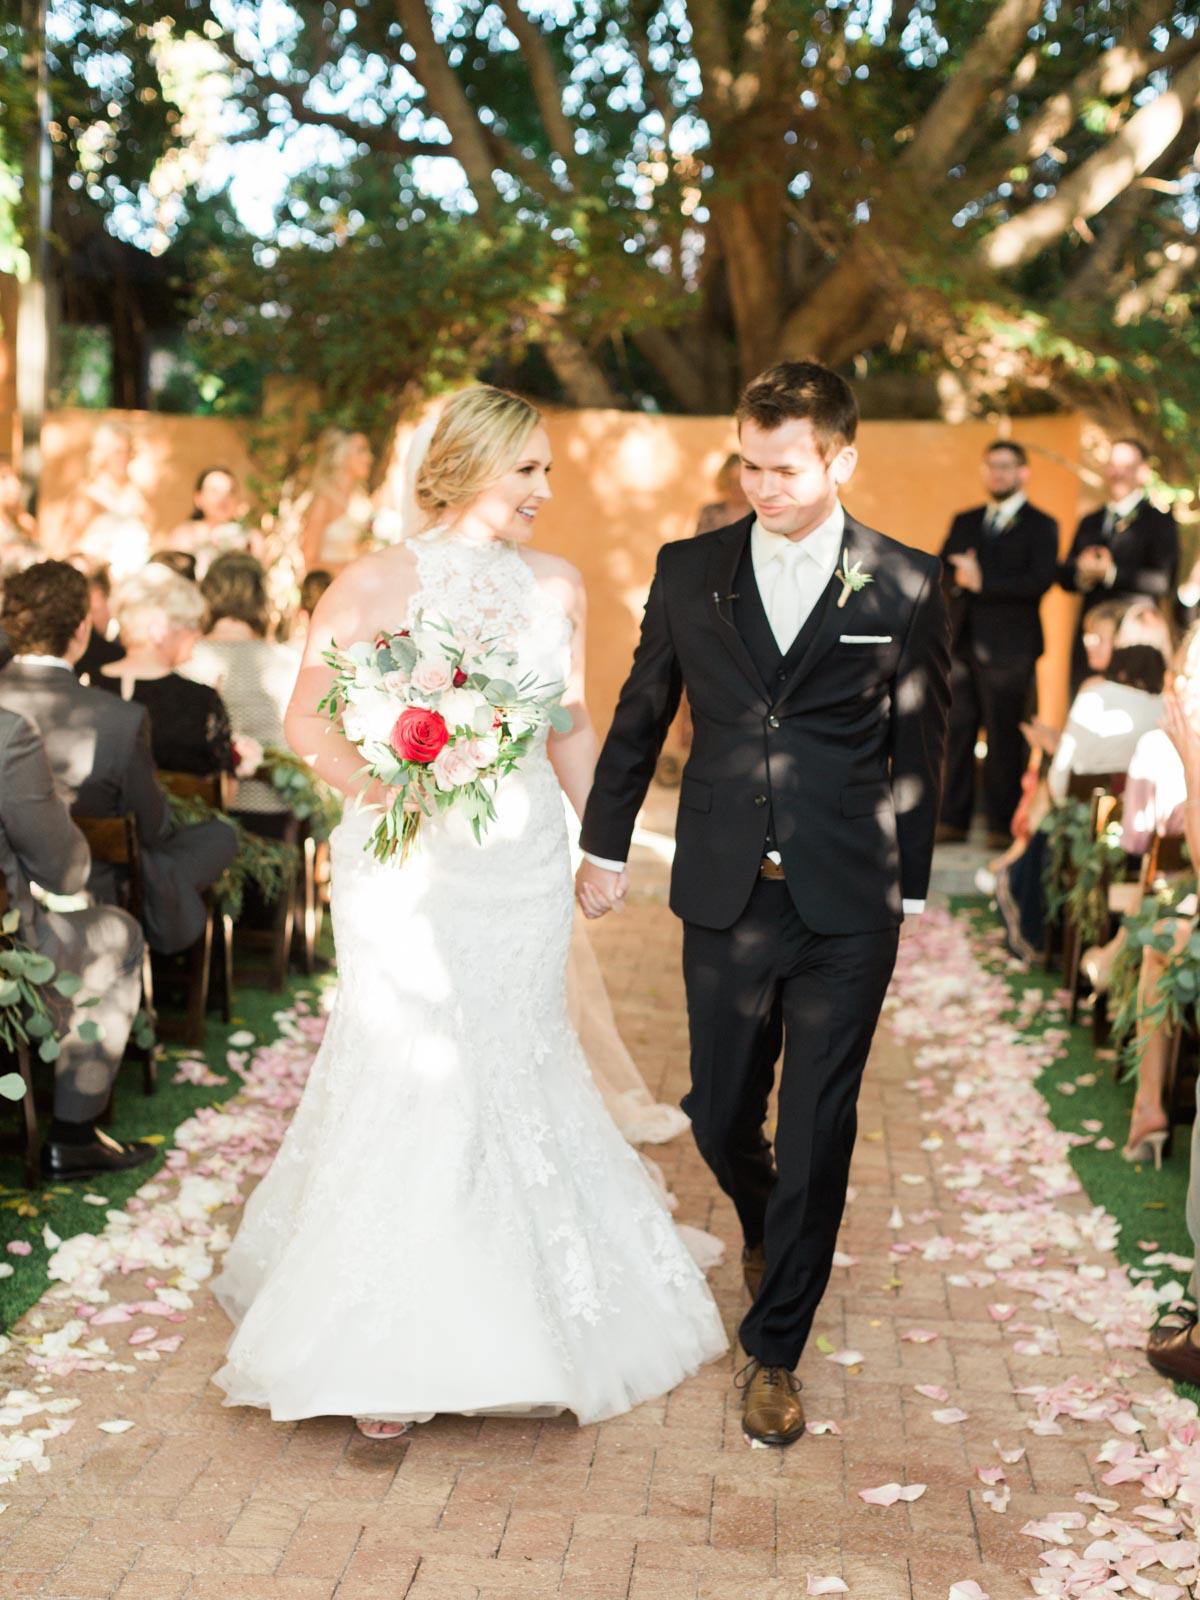 walking-down-wedding-aisle.jpg